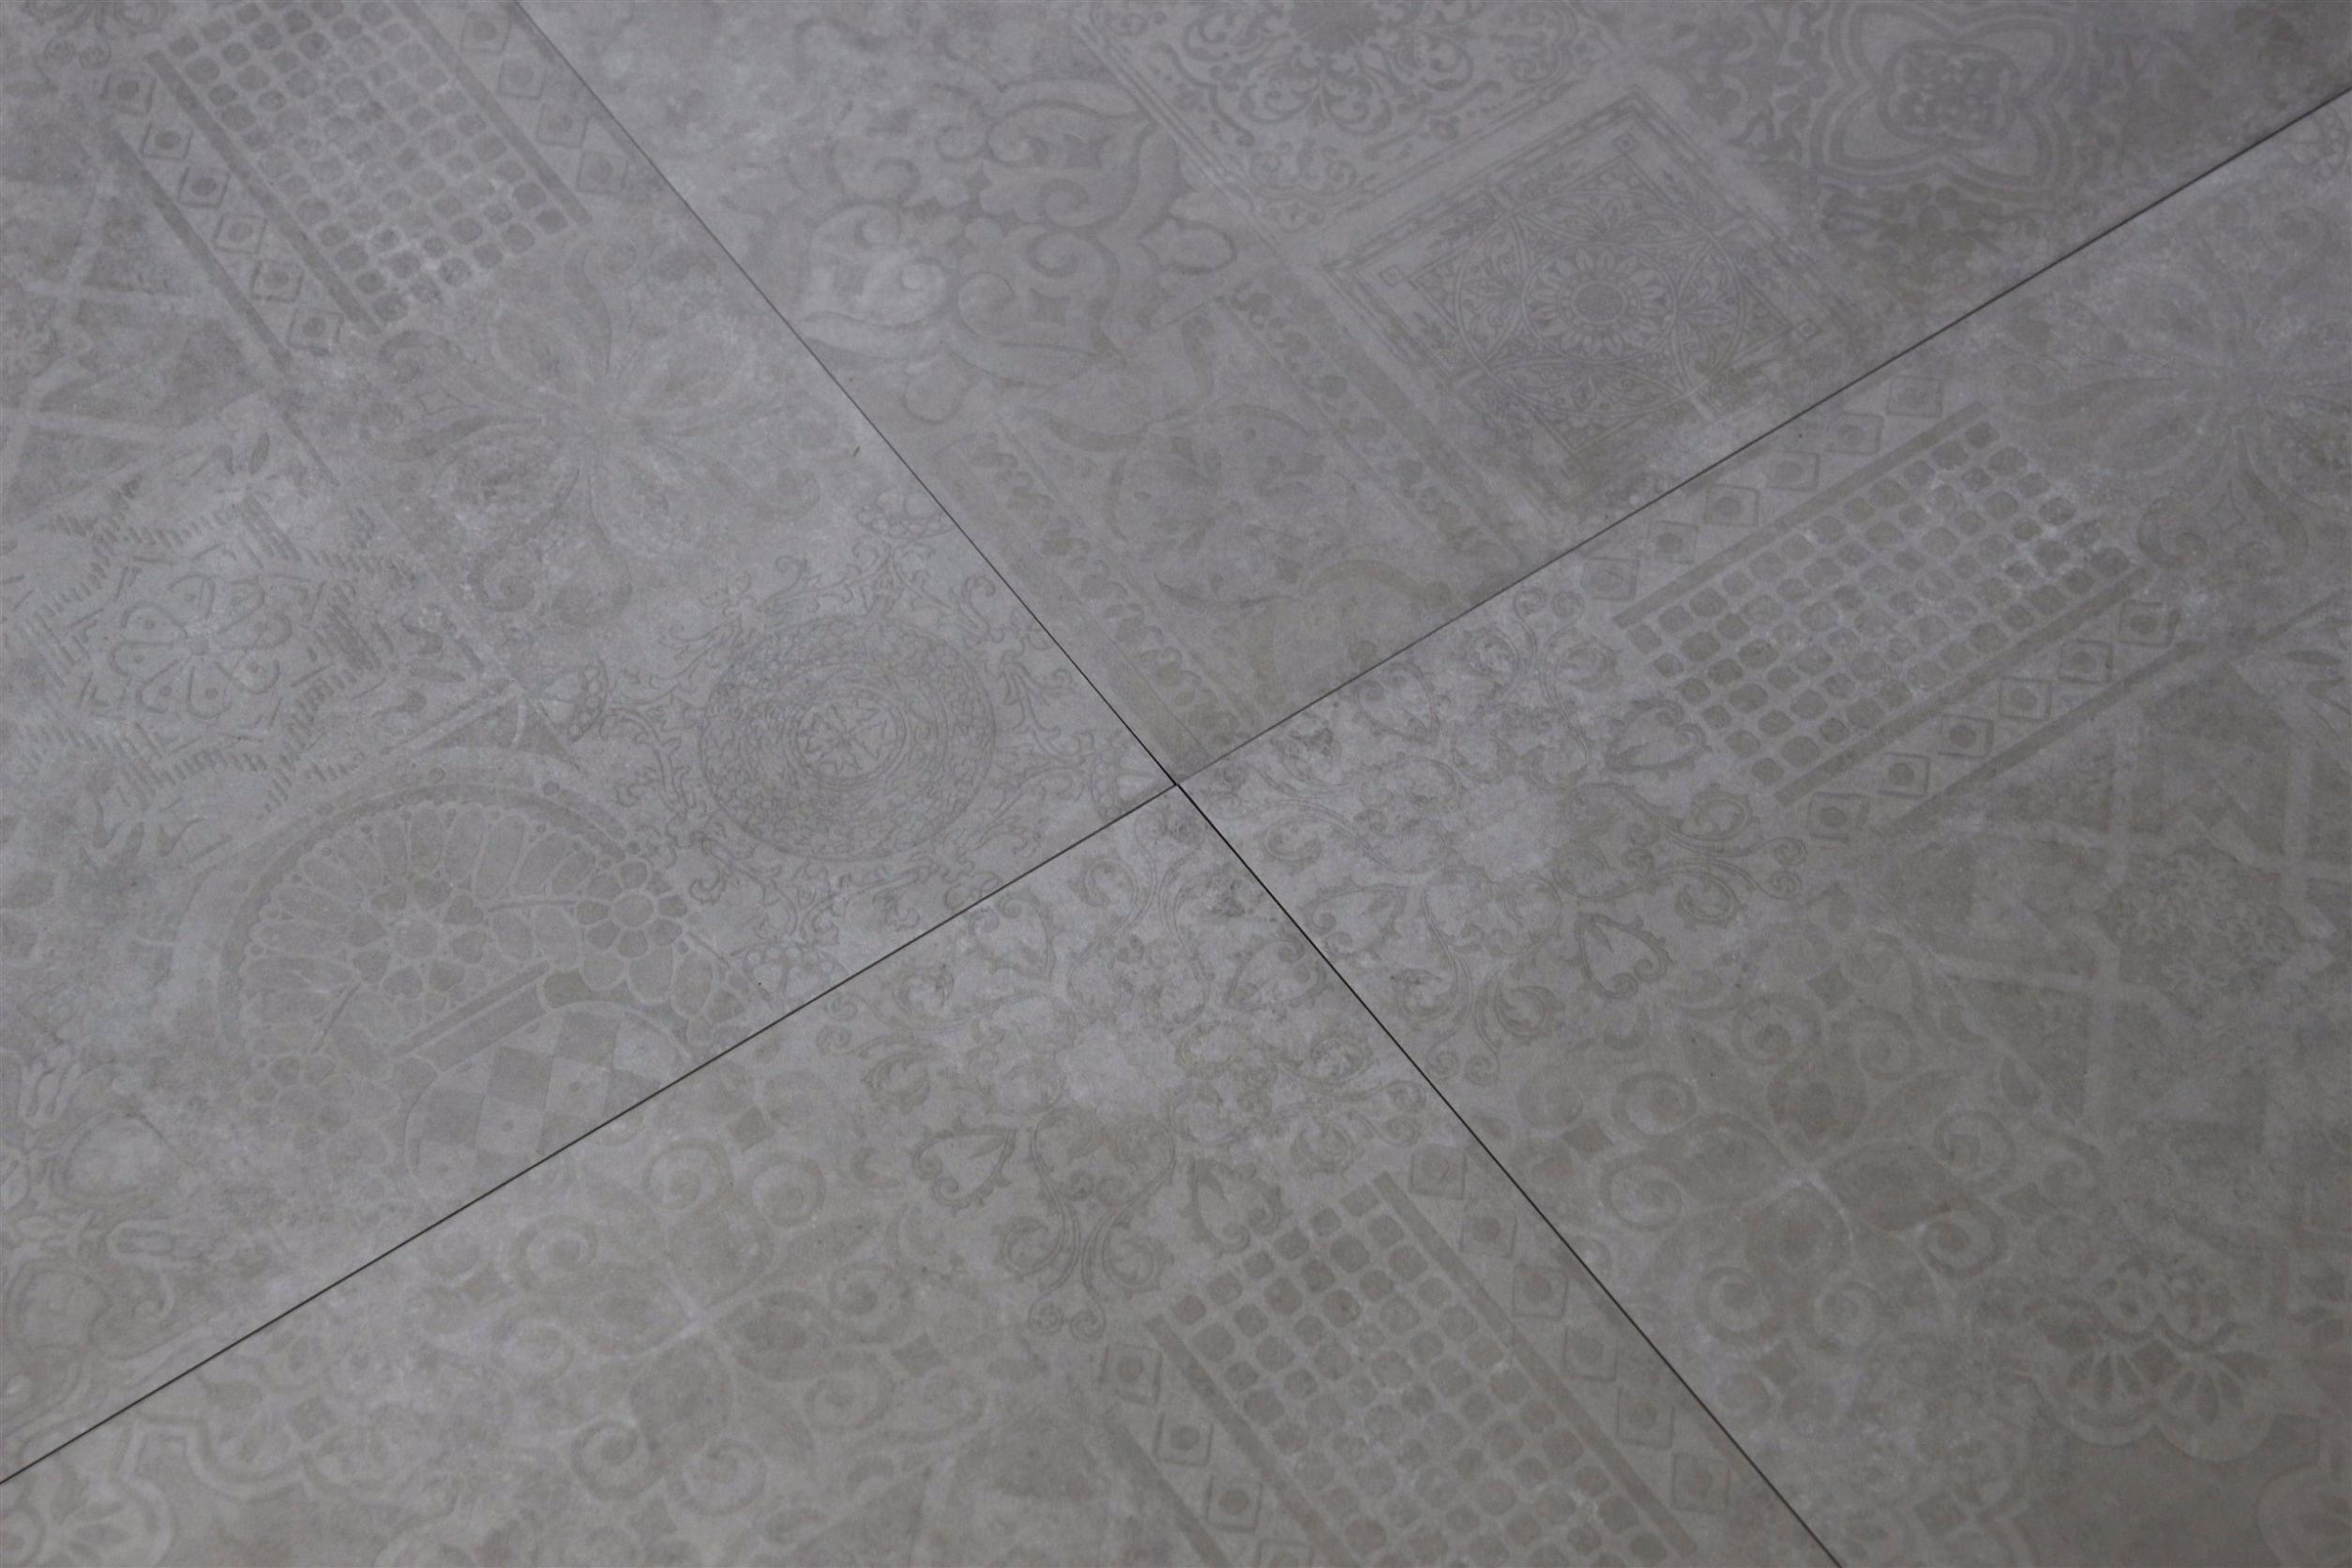 płytki szare patchwork 60x60 Icon Silver Patchwork abitare